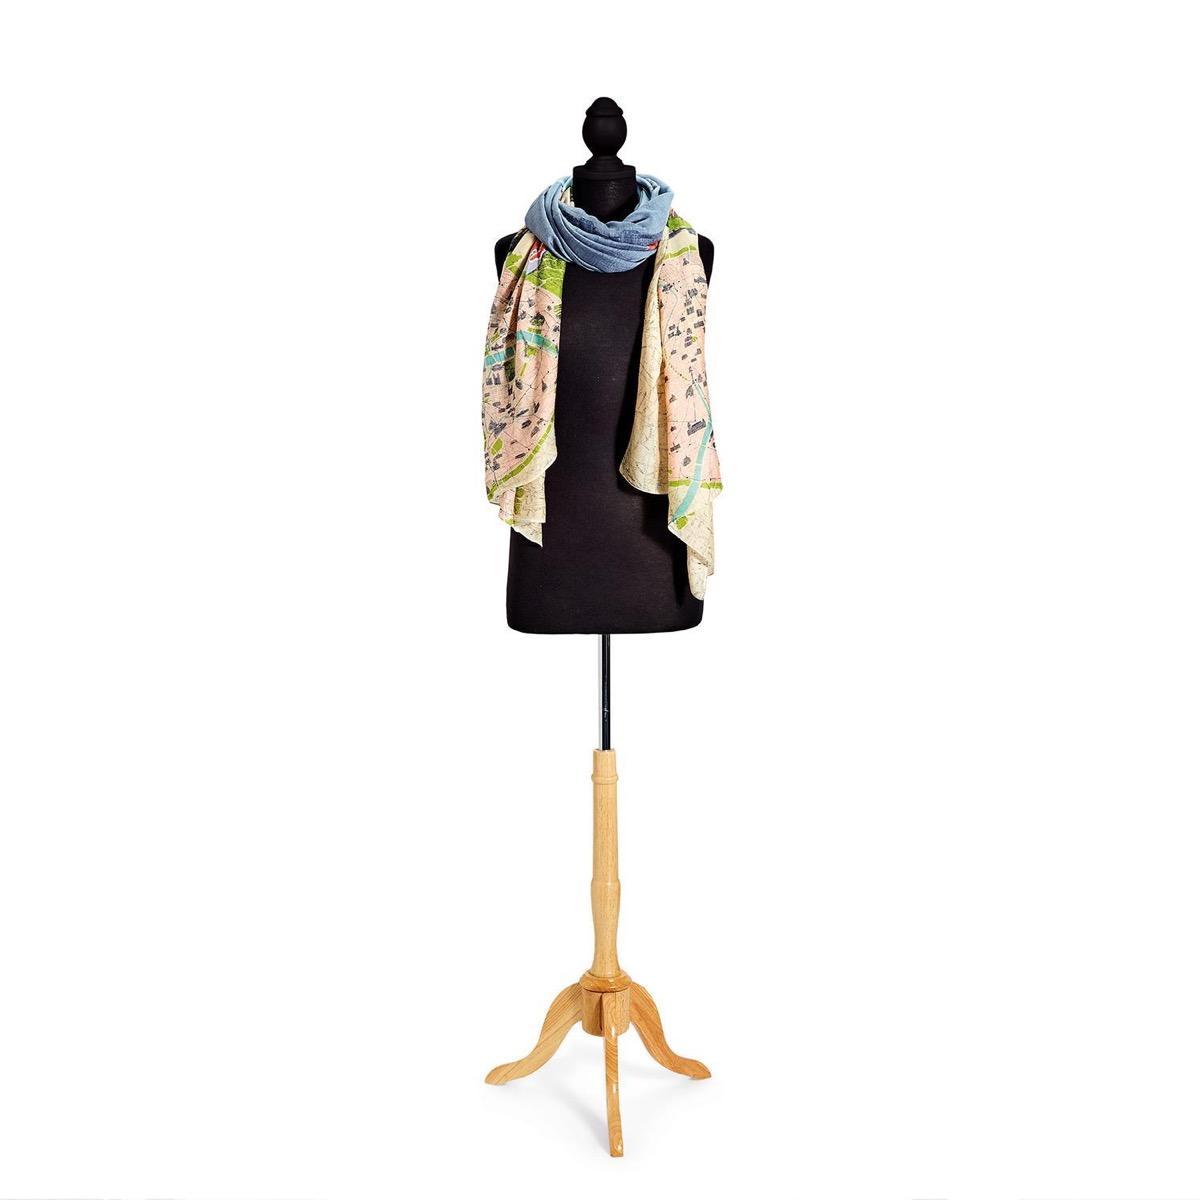 Eiffel Tower scarf on mannequin